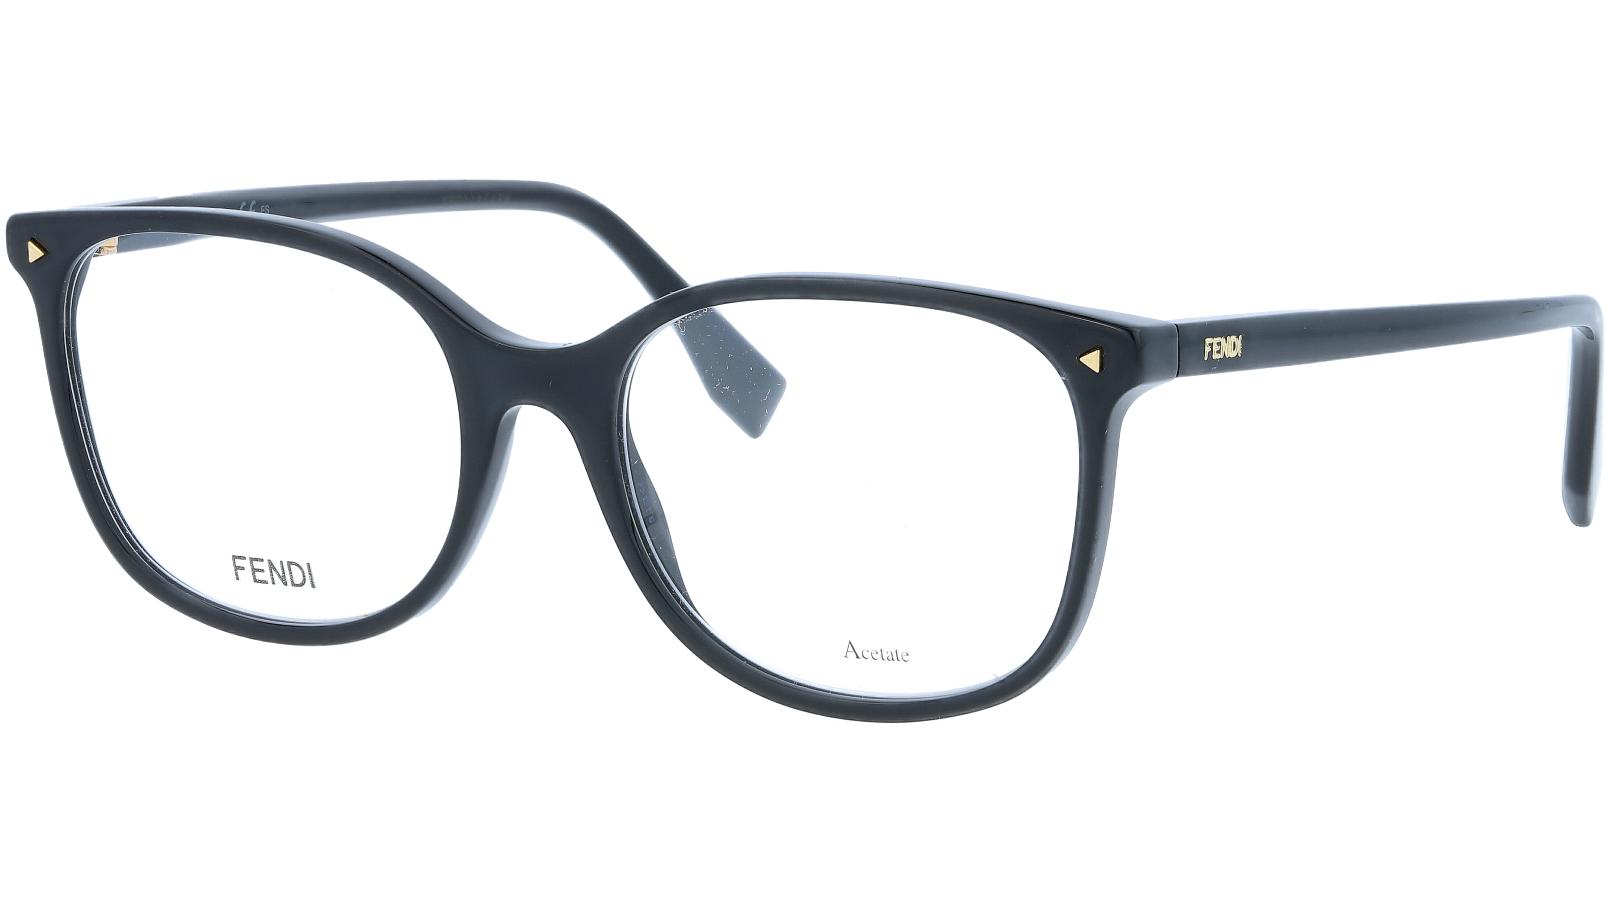 FENDI FF0387 807 53 BLACK Glasses